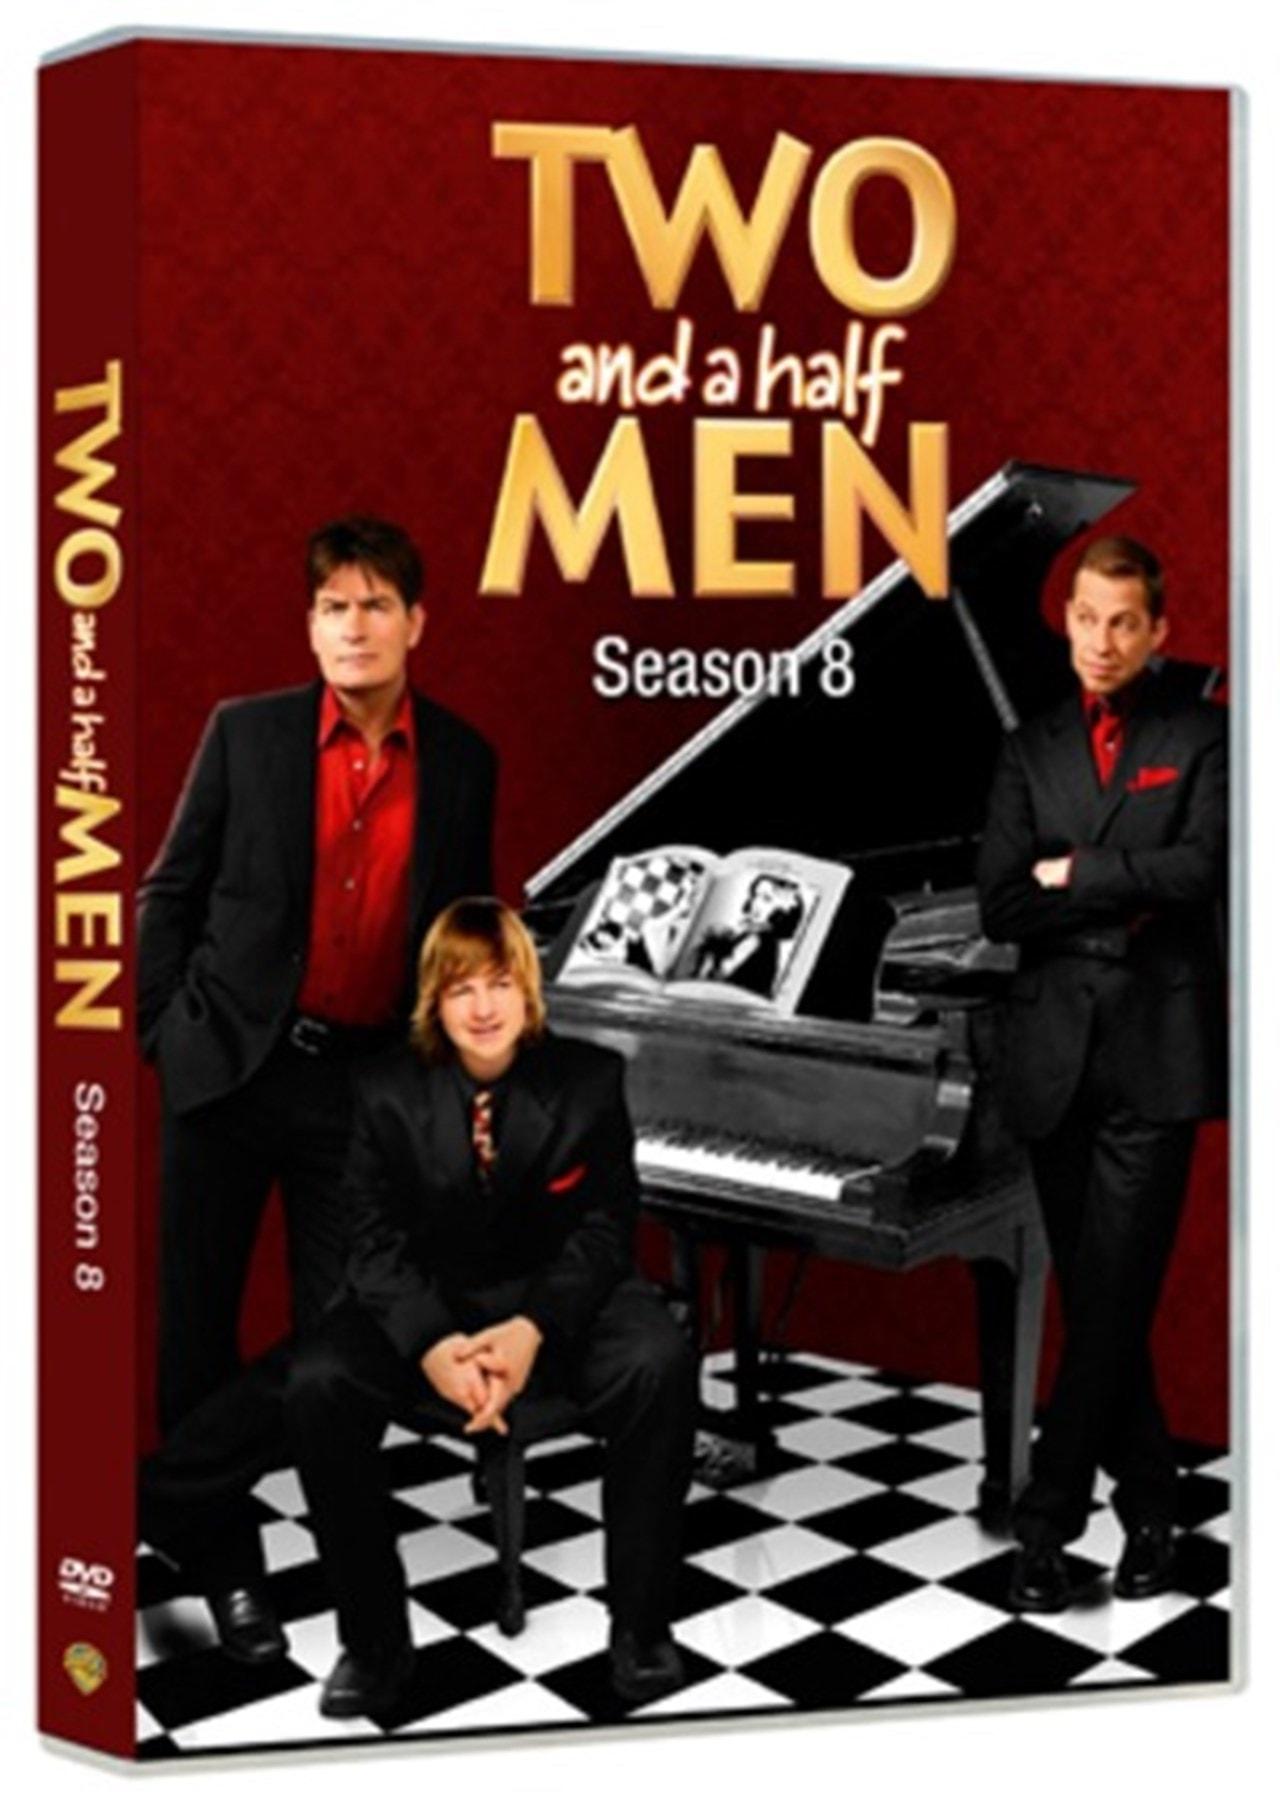 Two and a Half Men: Season 8 - 1